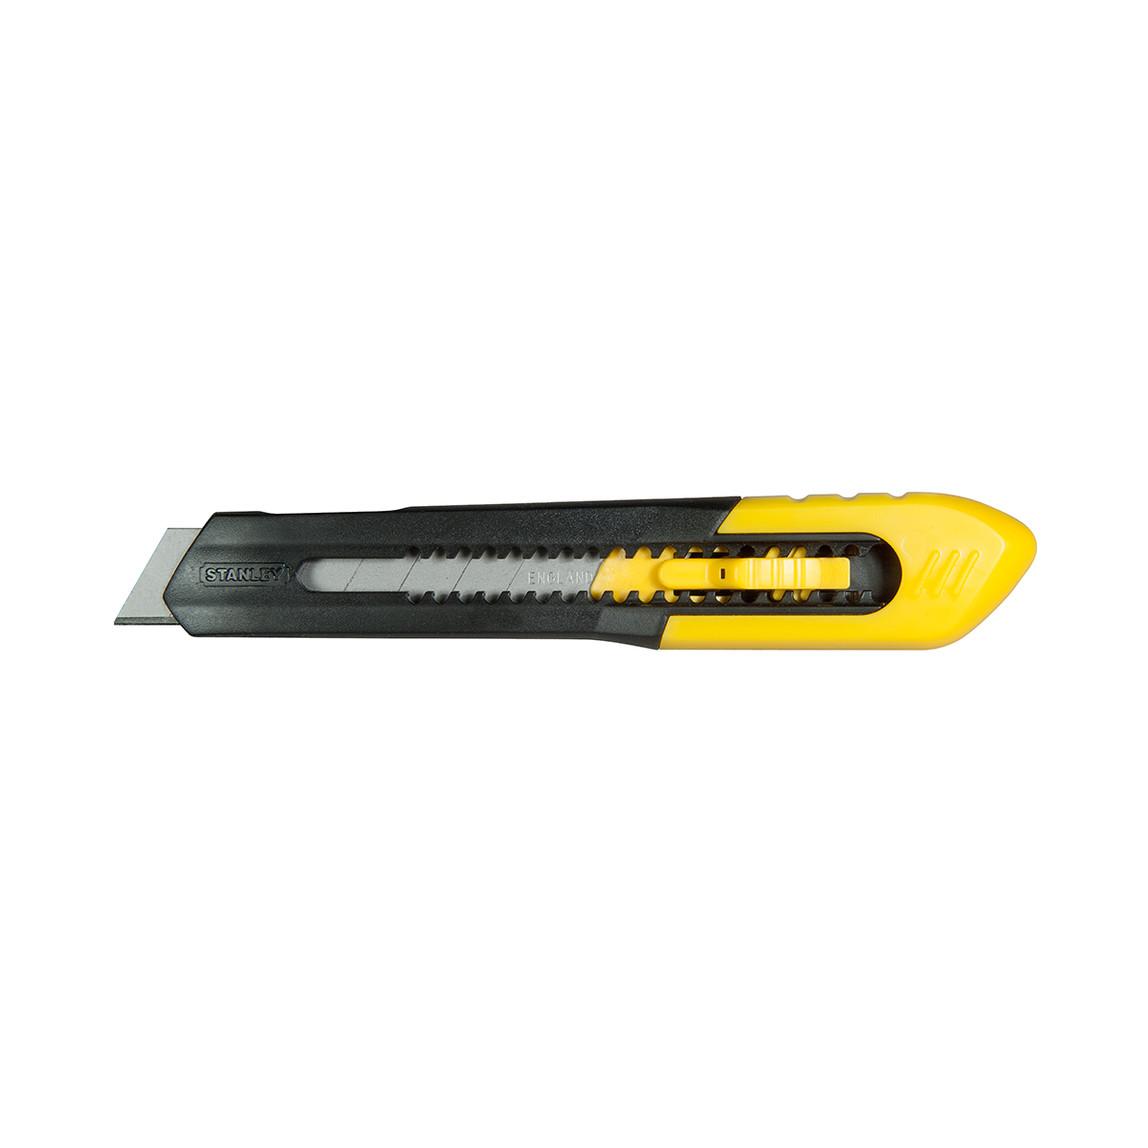 Stanley 160X18 mm Sm Maket Bıçağı